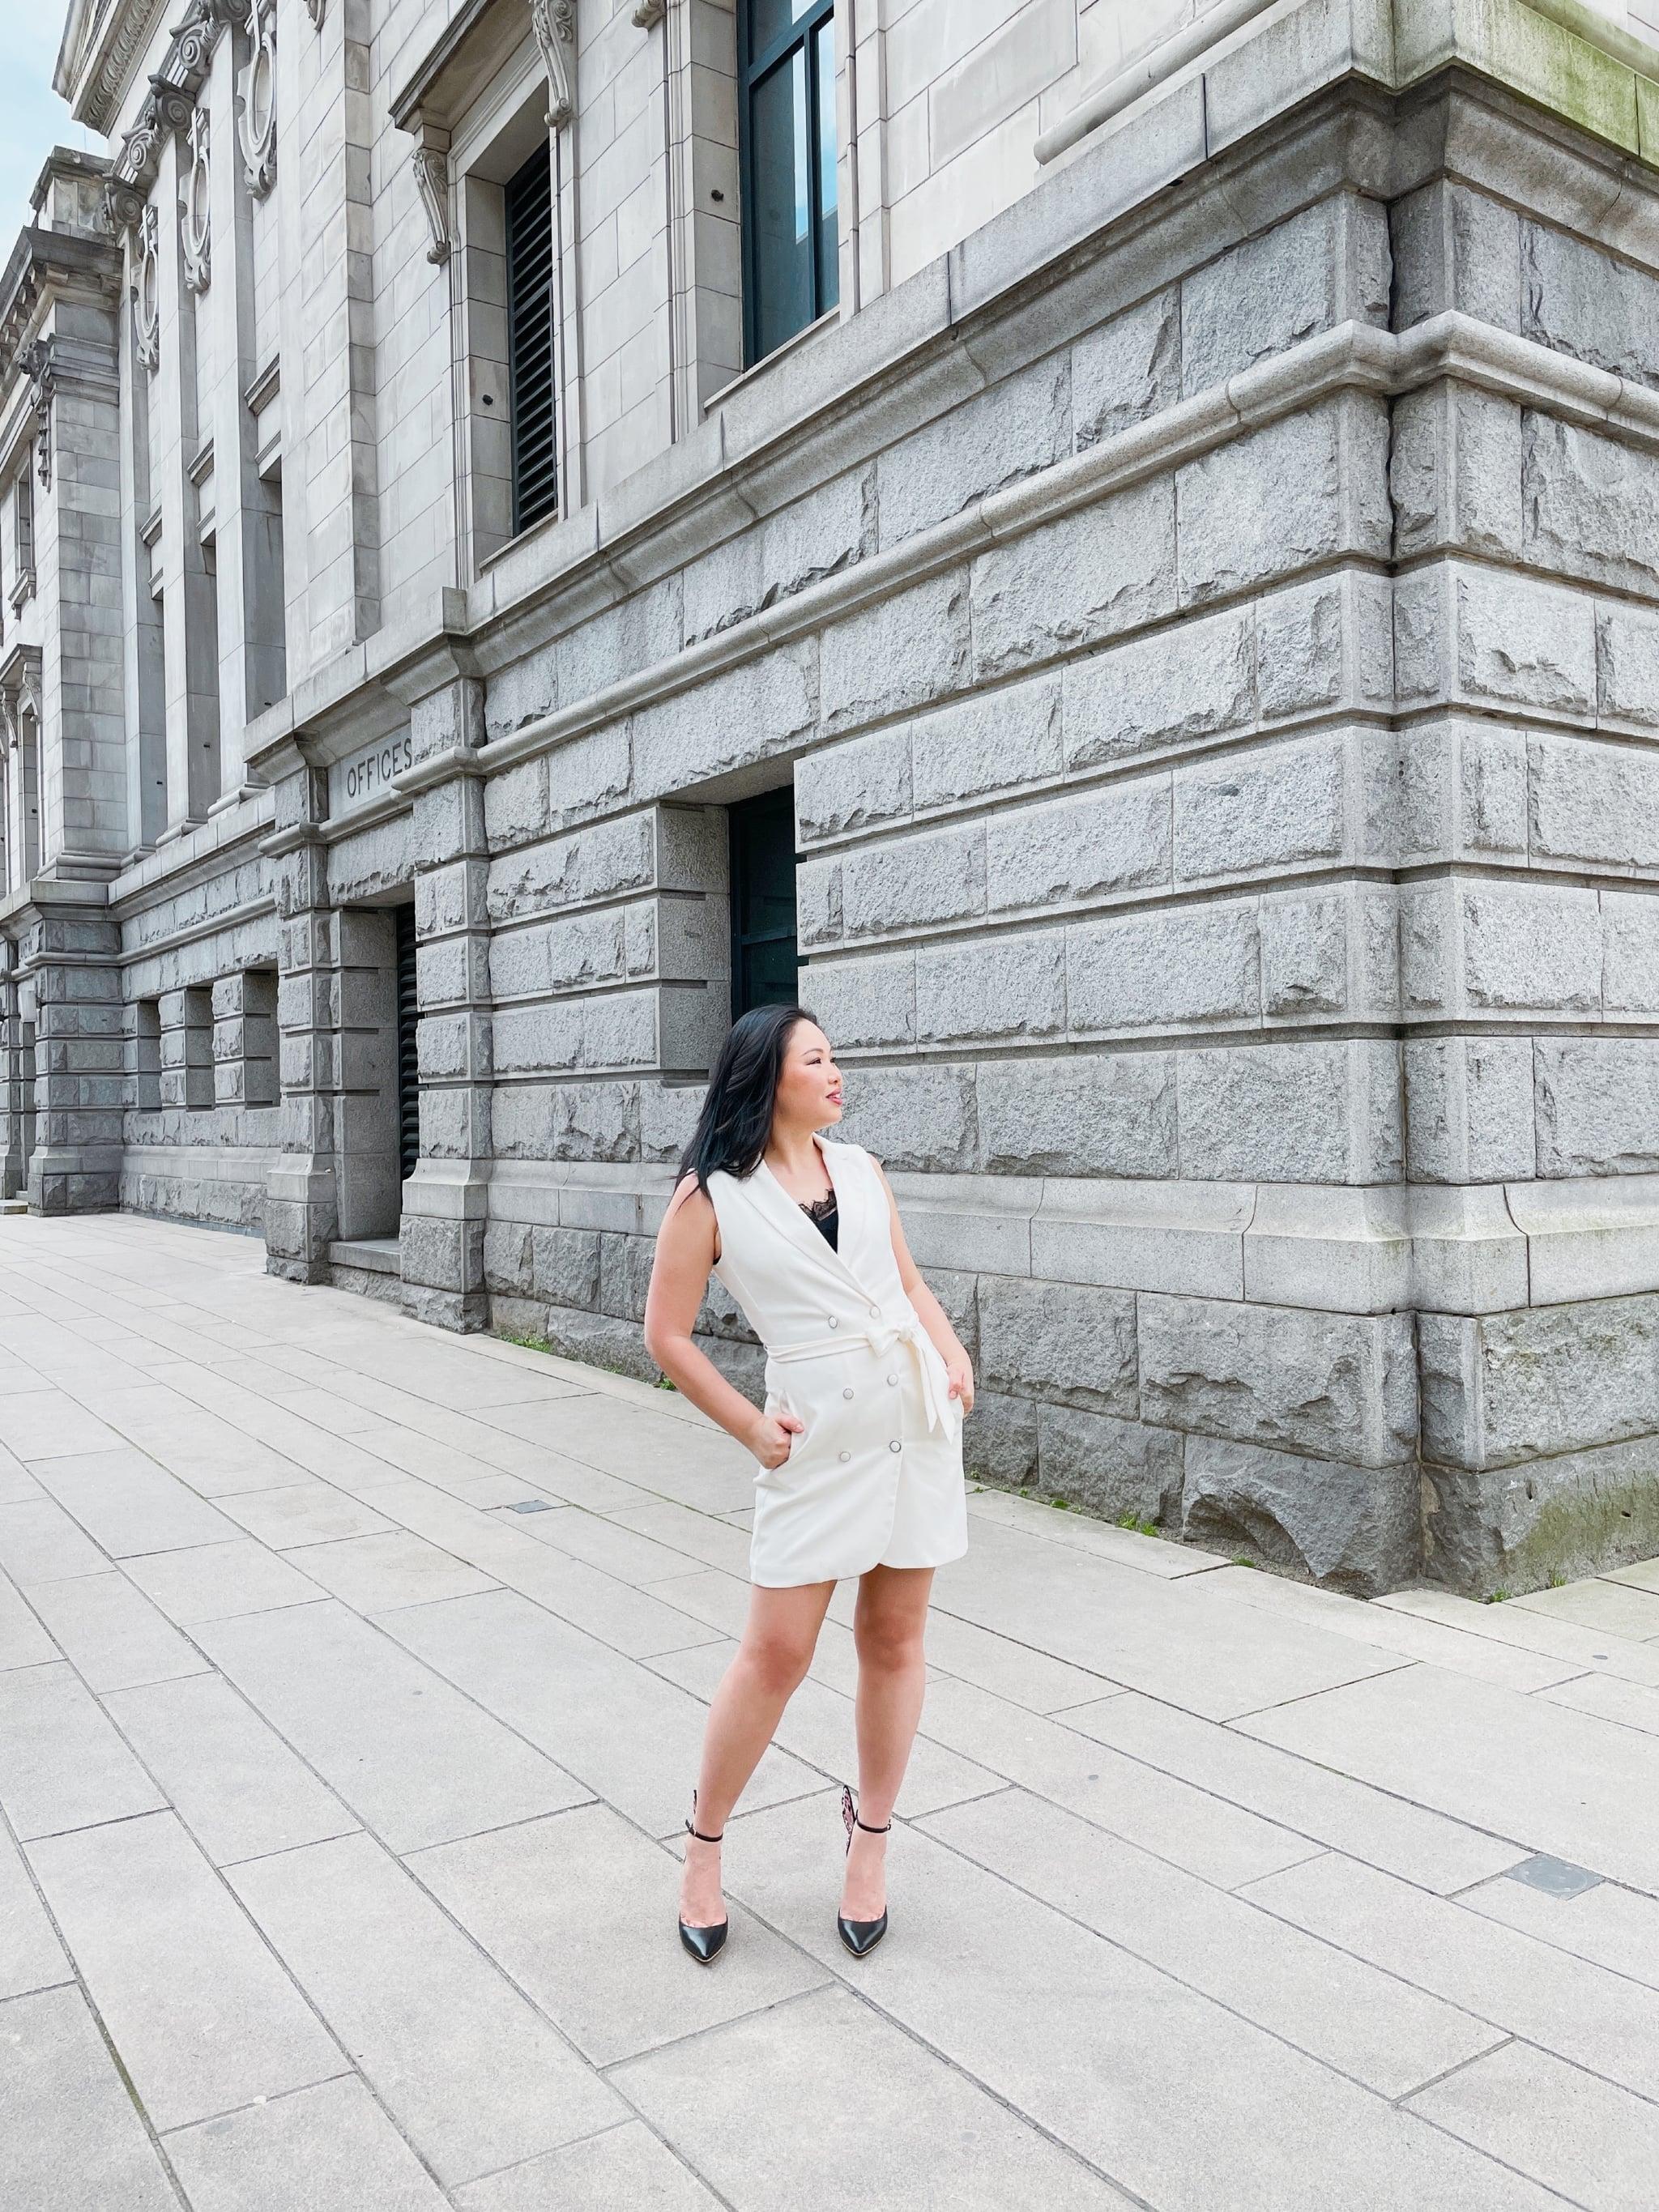 Julia Cha - Life after abuse